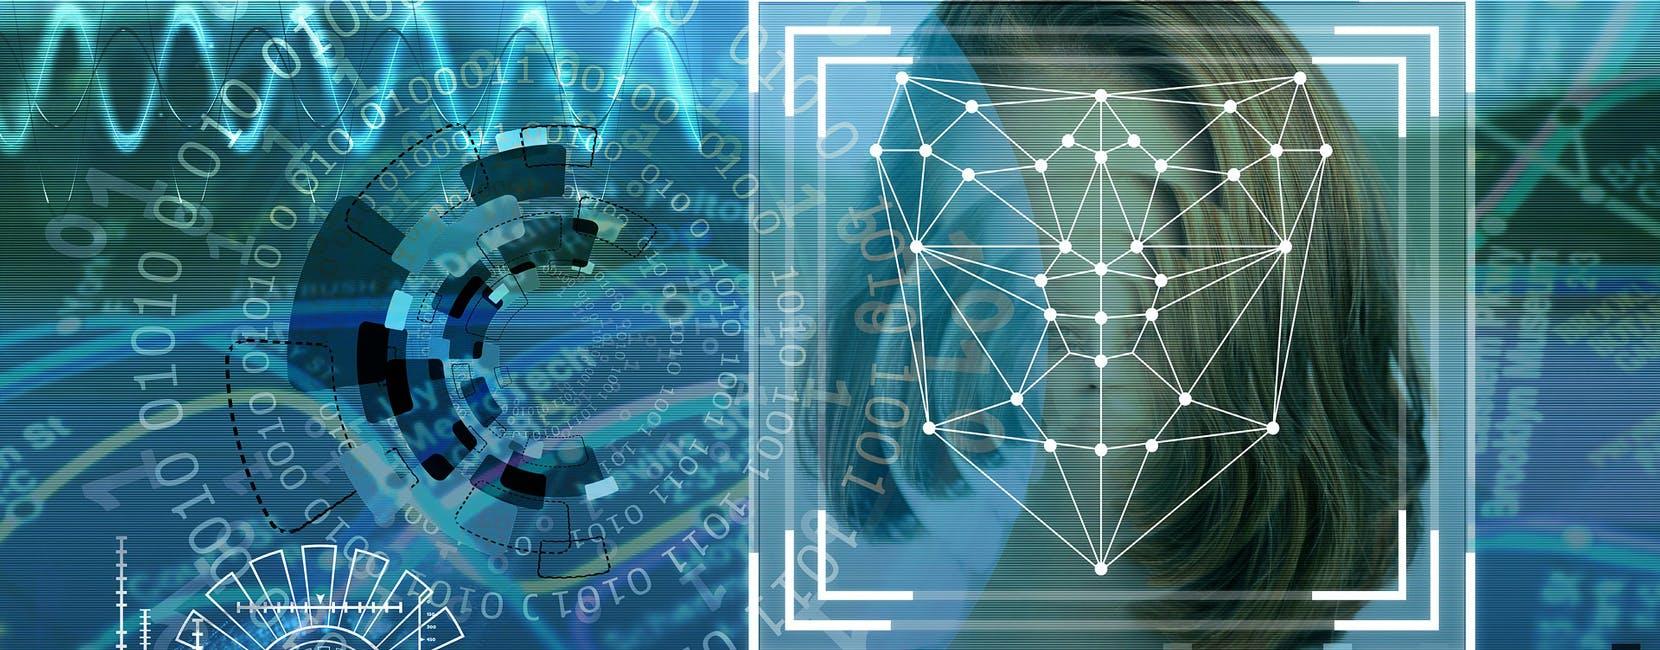 Face authentication technology